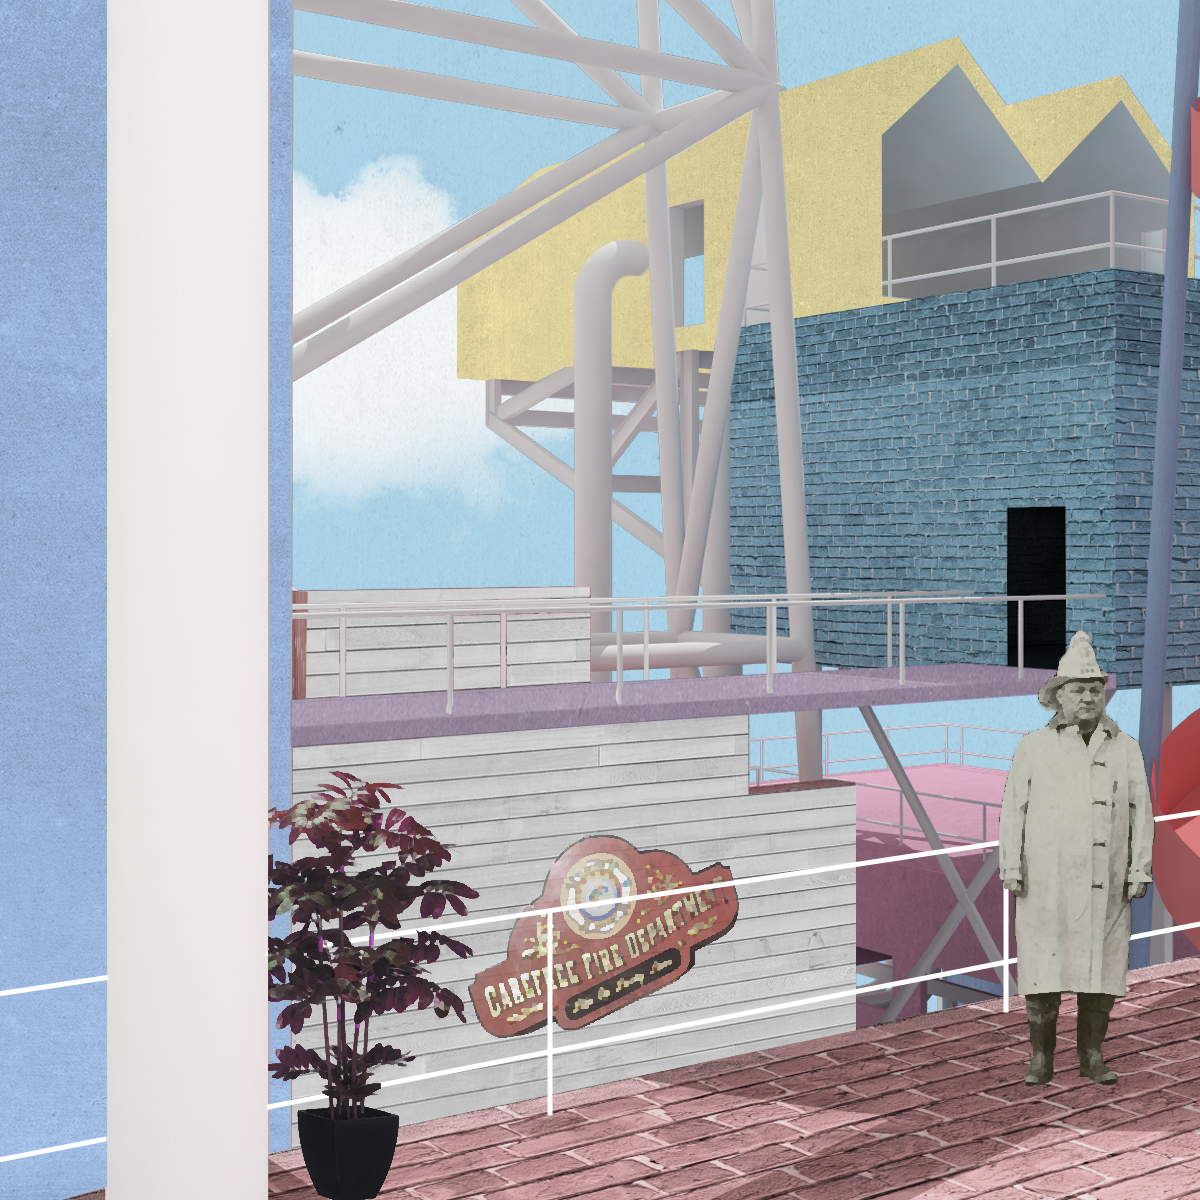 10_I am a Firestation_Public 3_Tomas Tran_UCLA